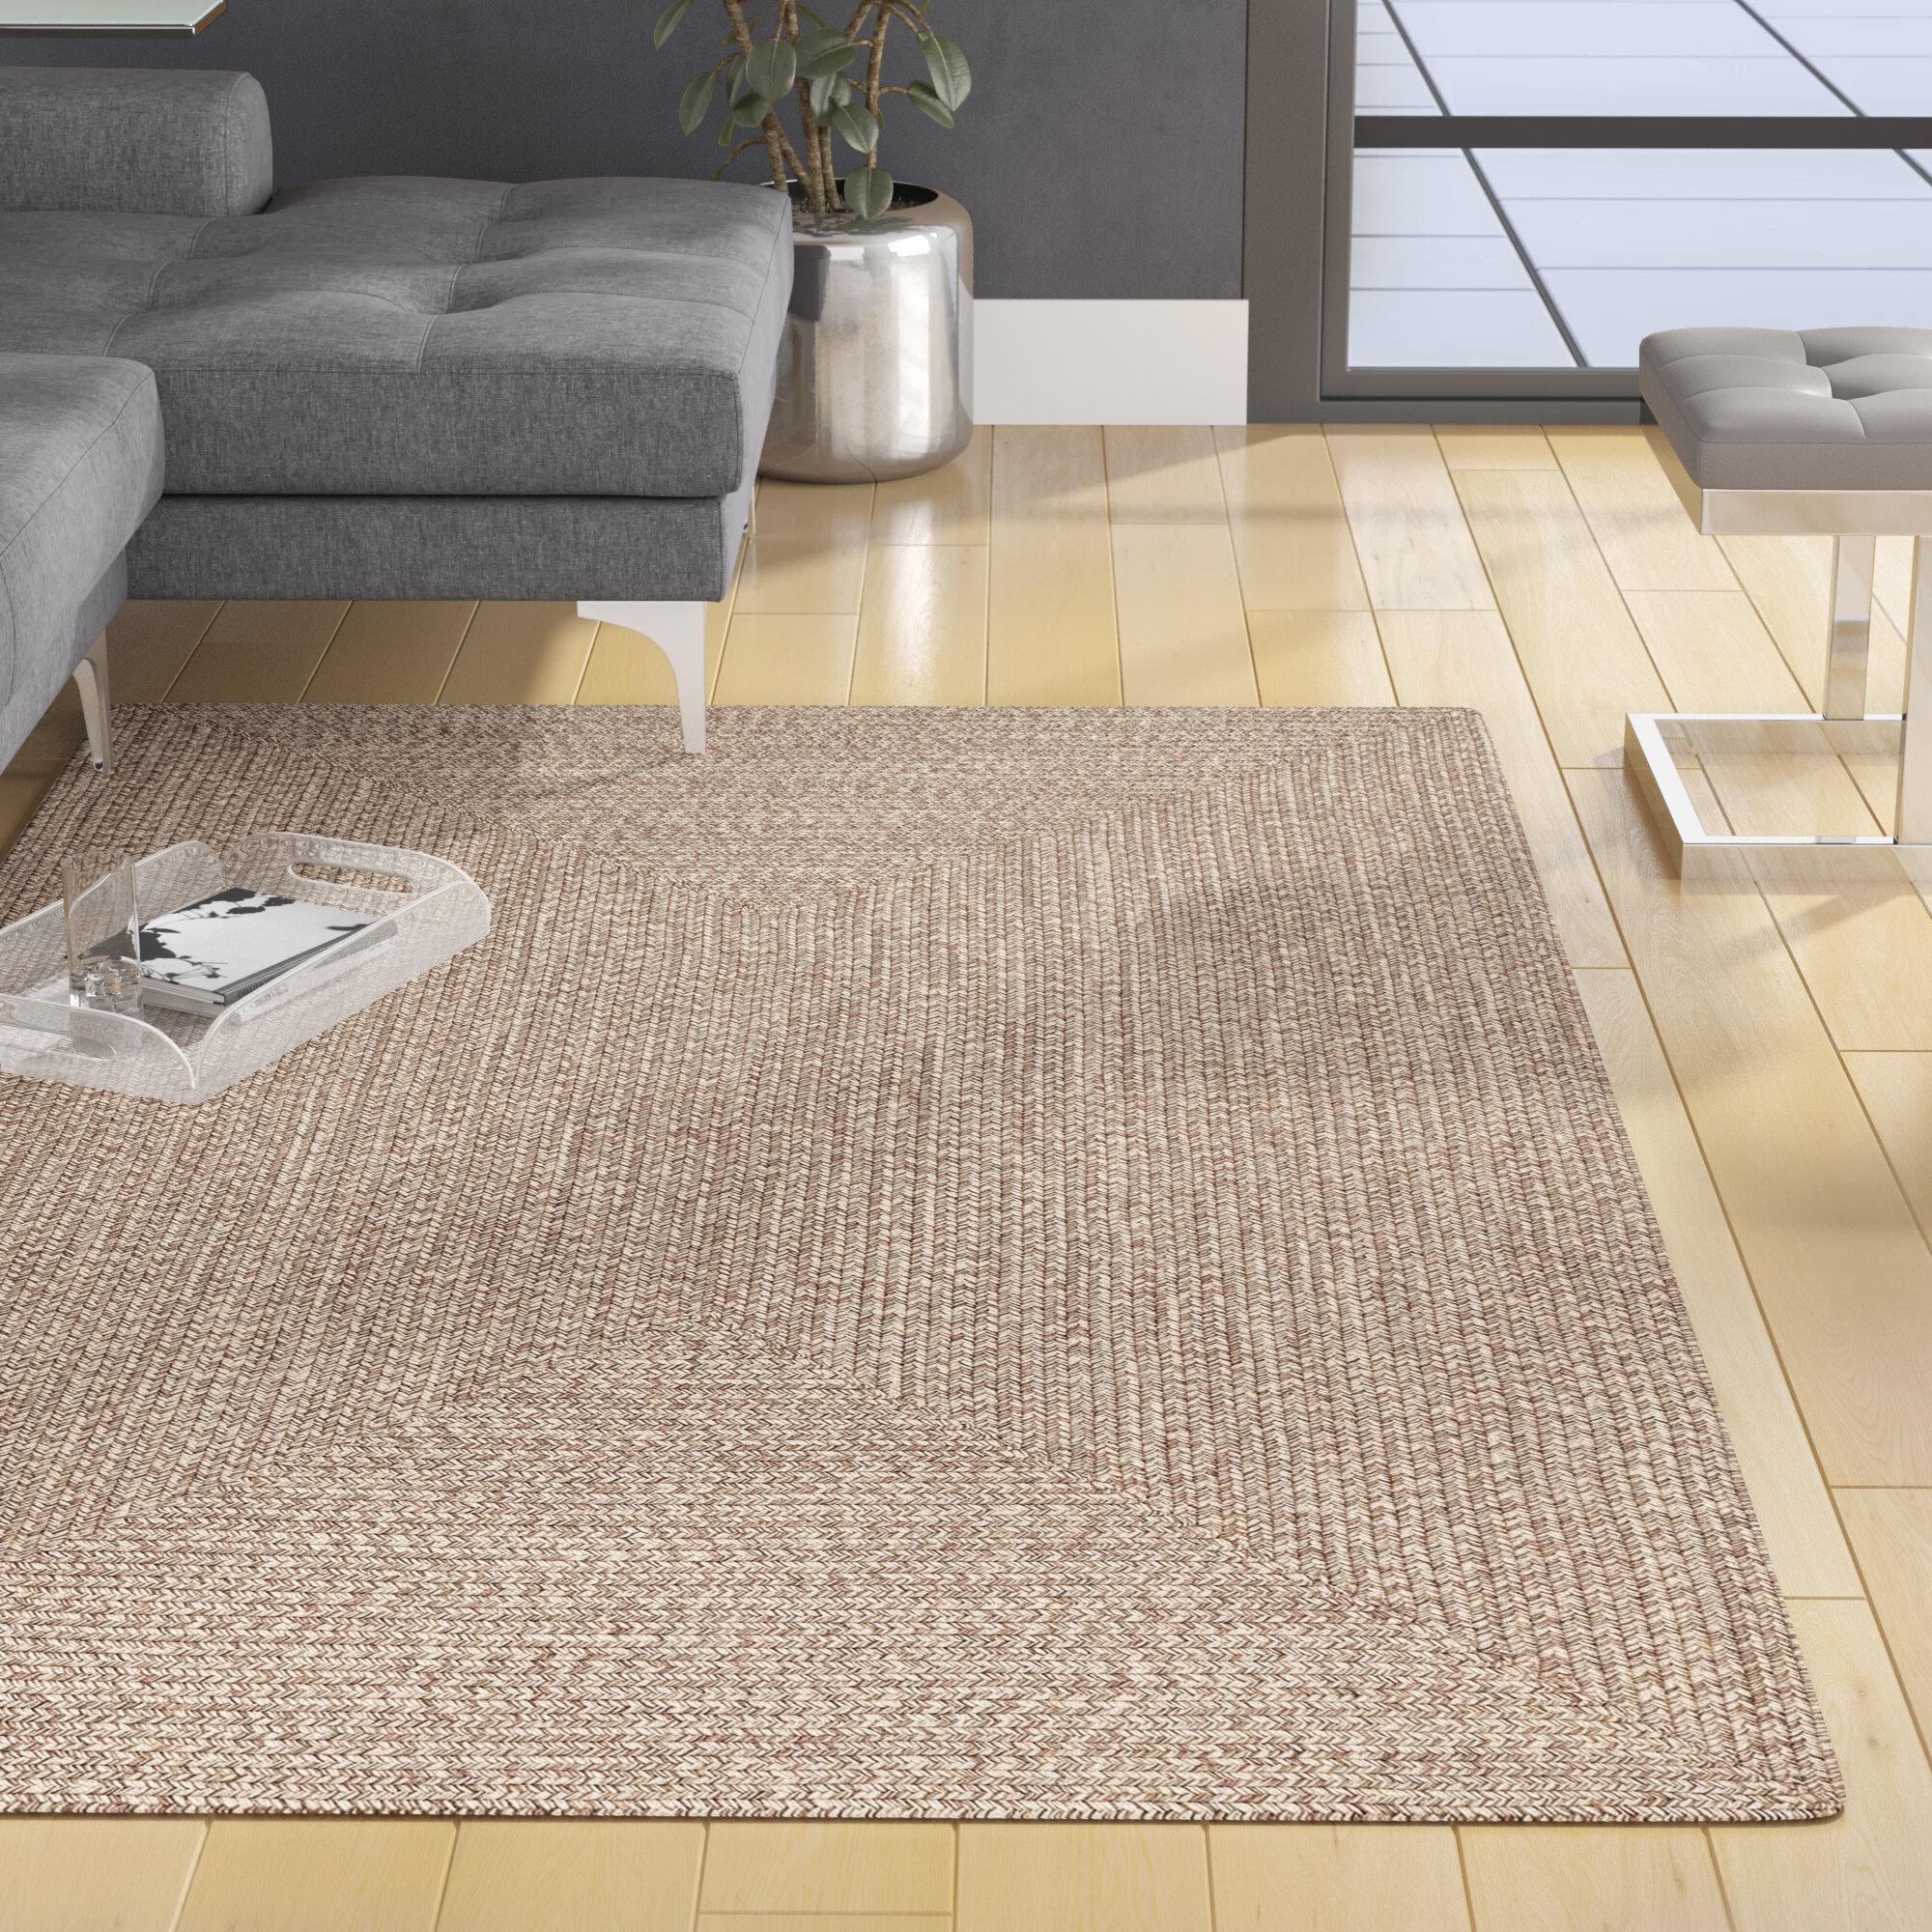 Indoor Outdoor Round Area Rugs Free Shipping Over 35 Wayfair